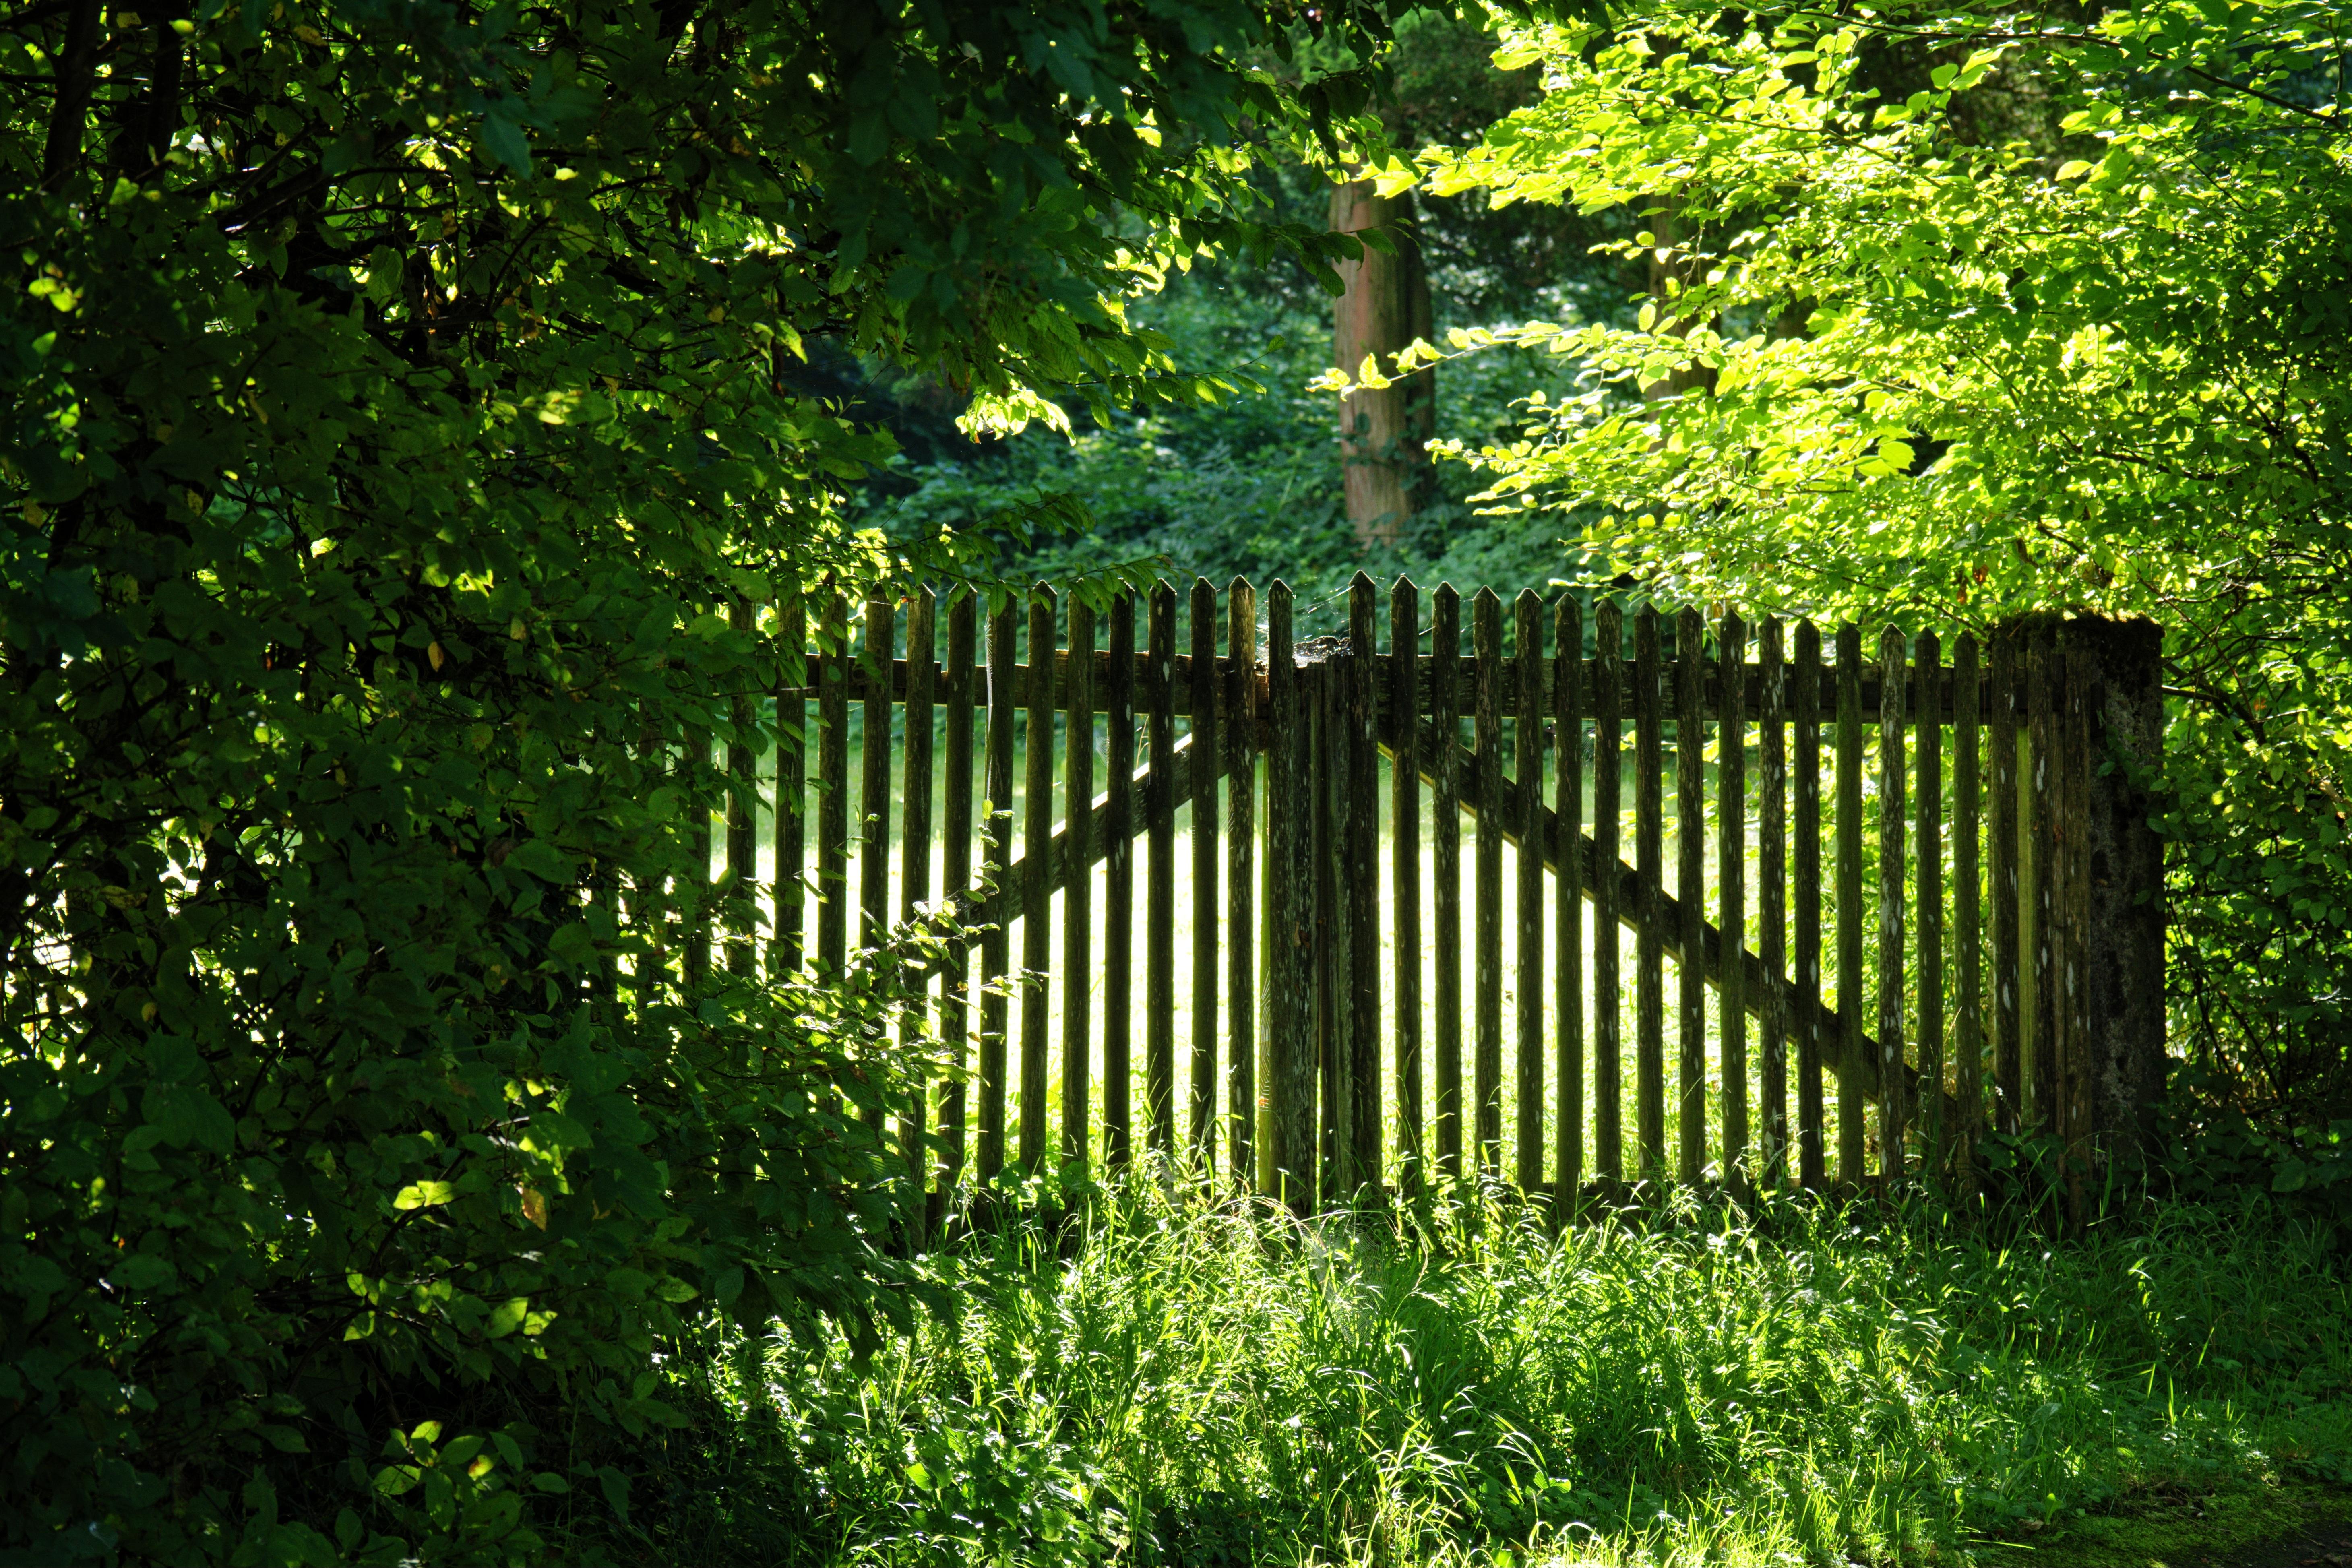 картинки лес и забор короткие шорты